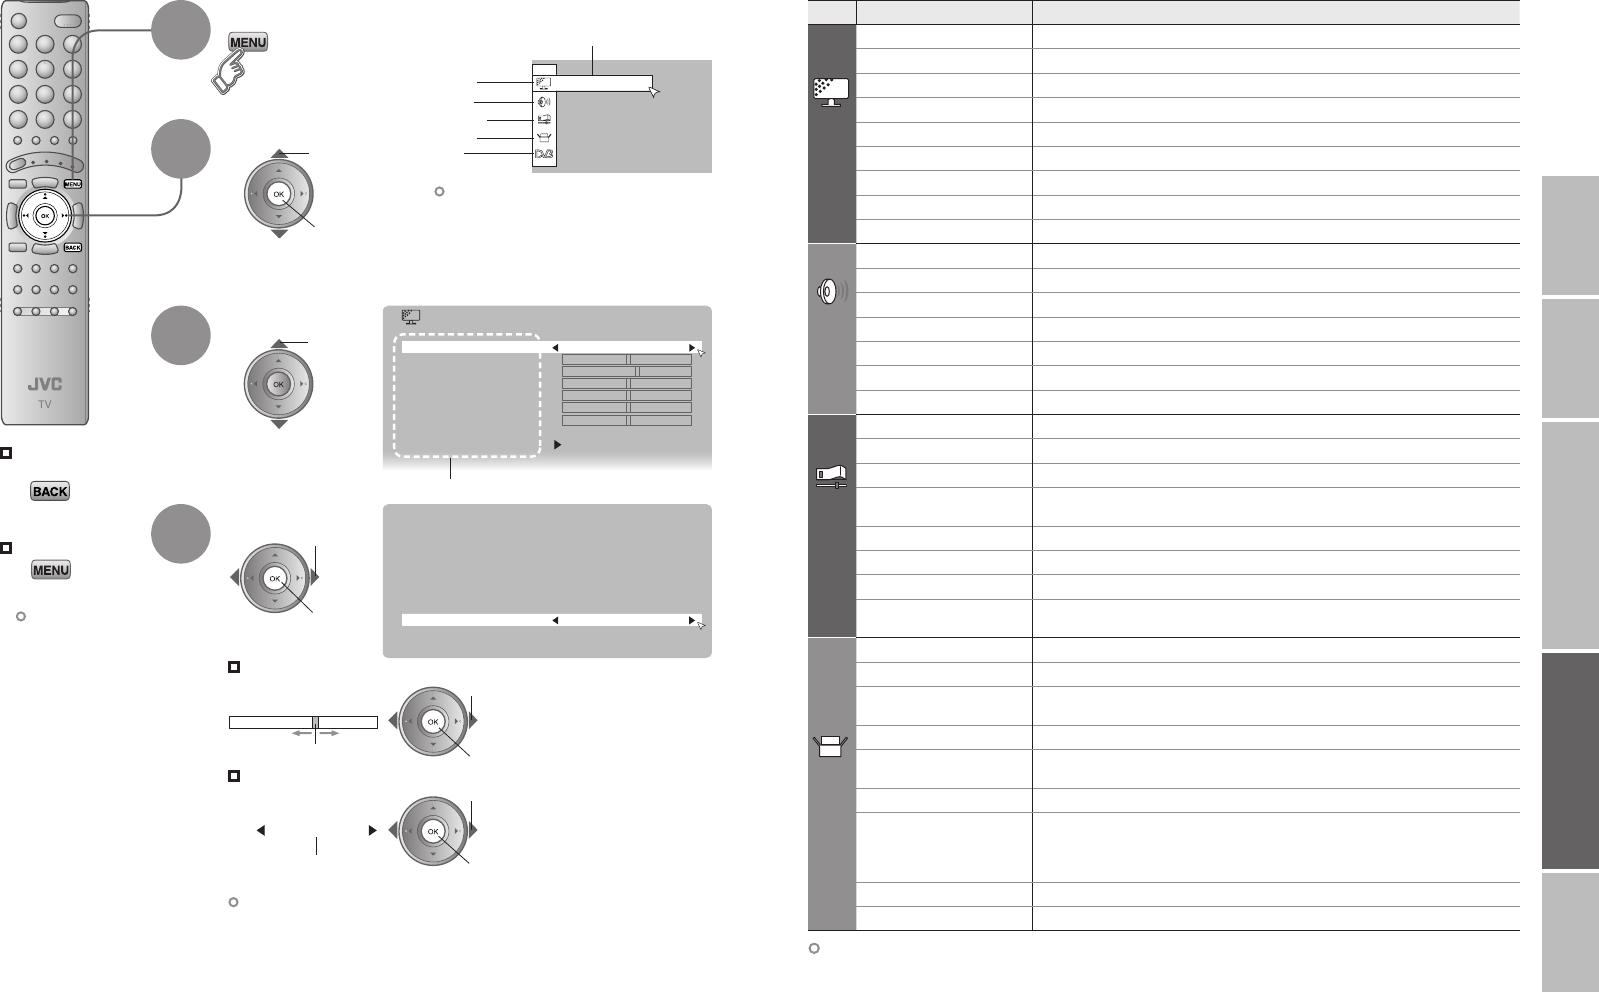 Jvc Lt 46dz7bj User Manual Lct2182 001a U En Wiring Diagram For S17 35